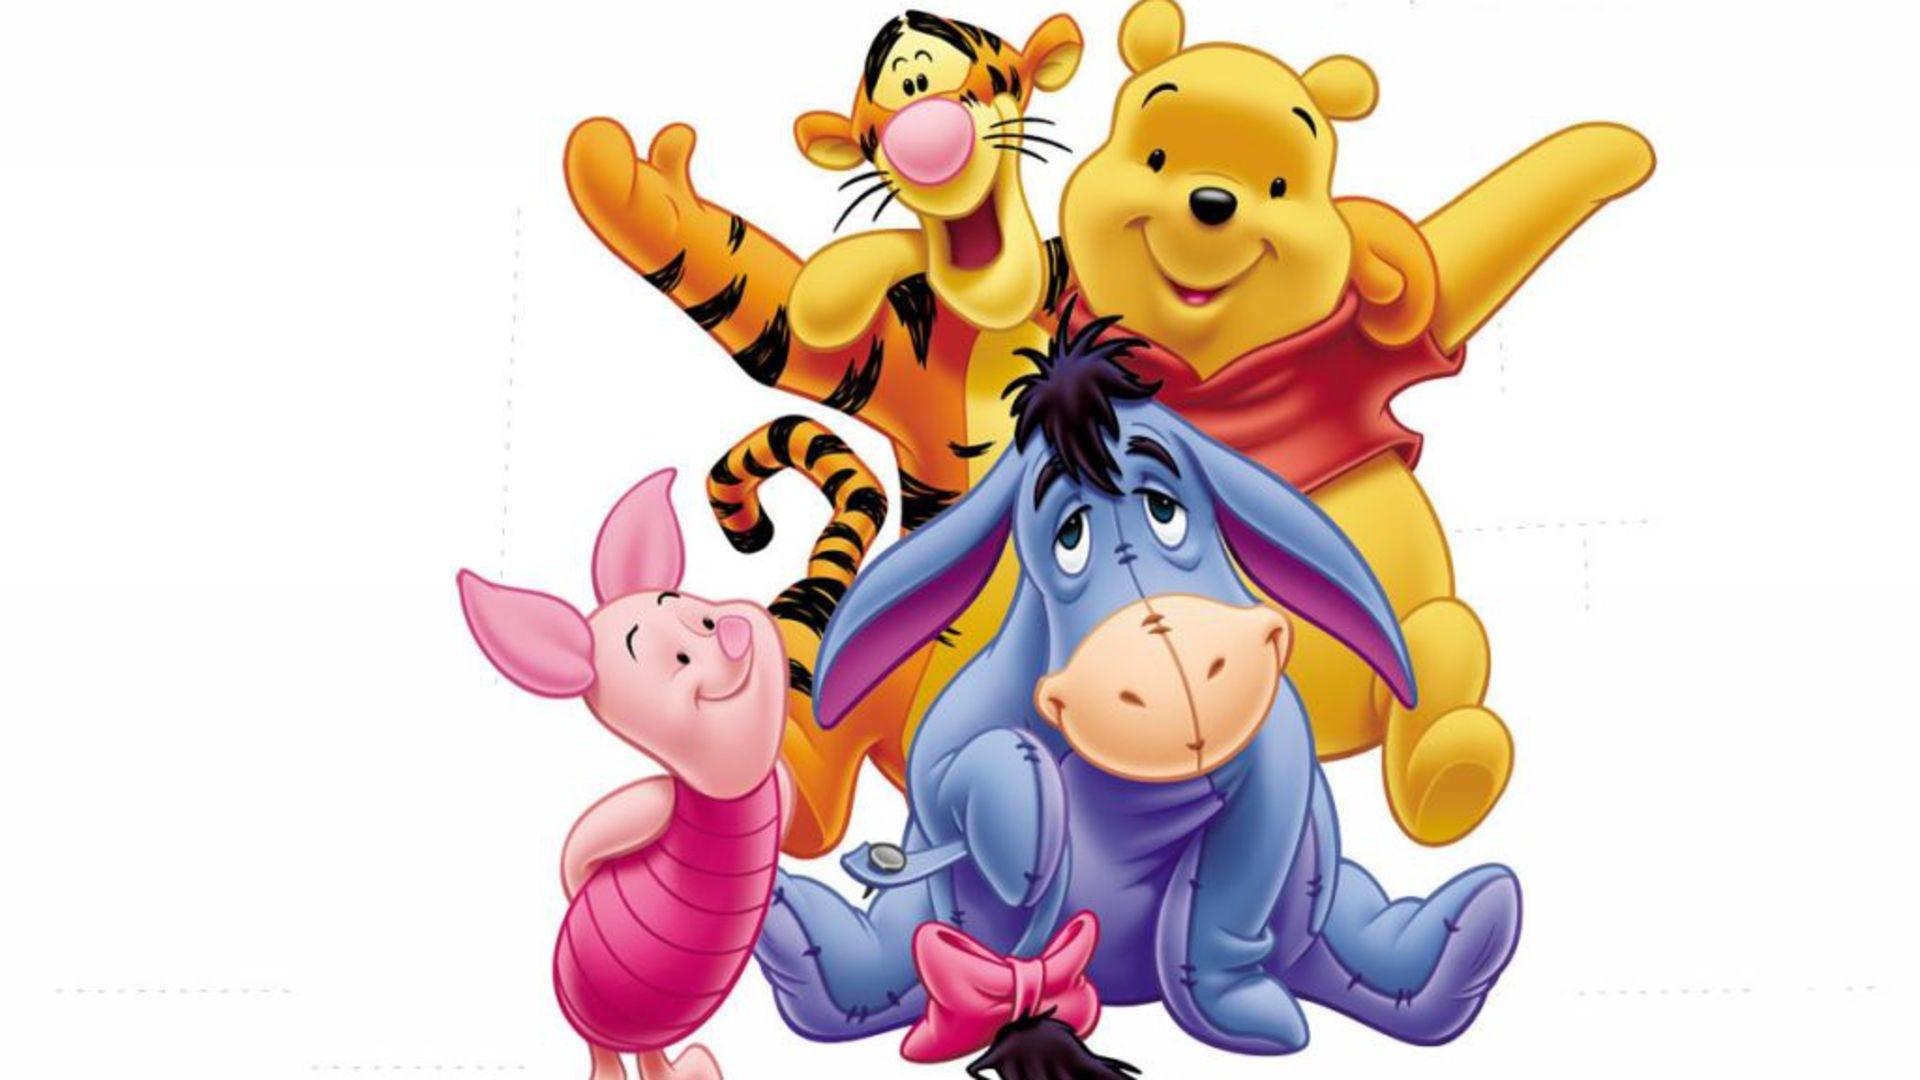 Res: 1920x1080, Free Winnie The Pooh Wallpaper 19933